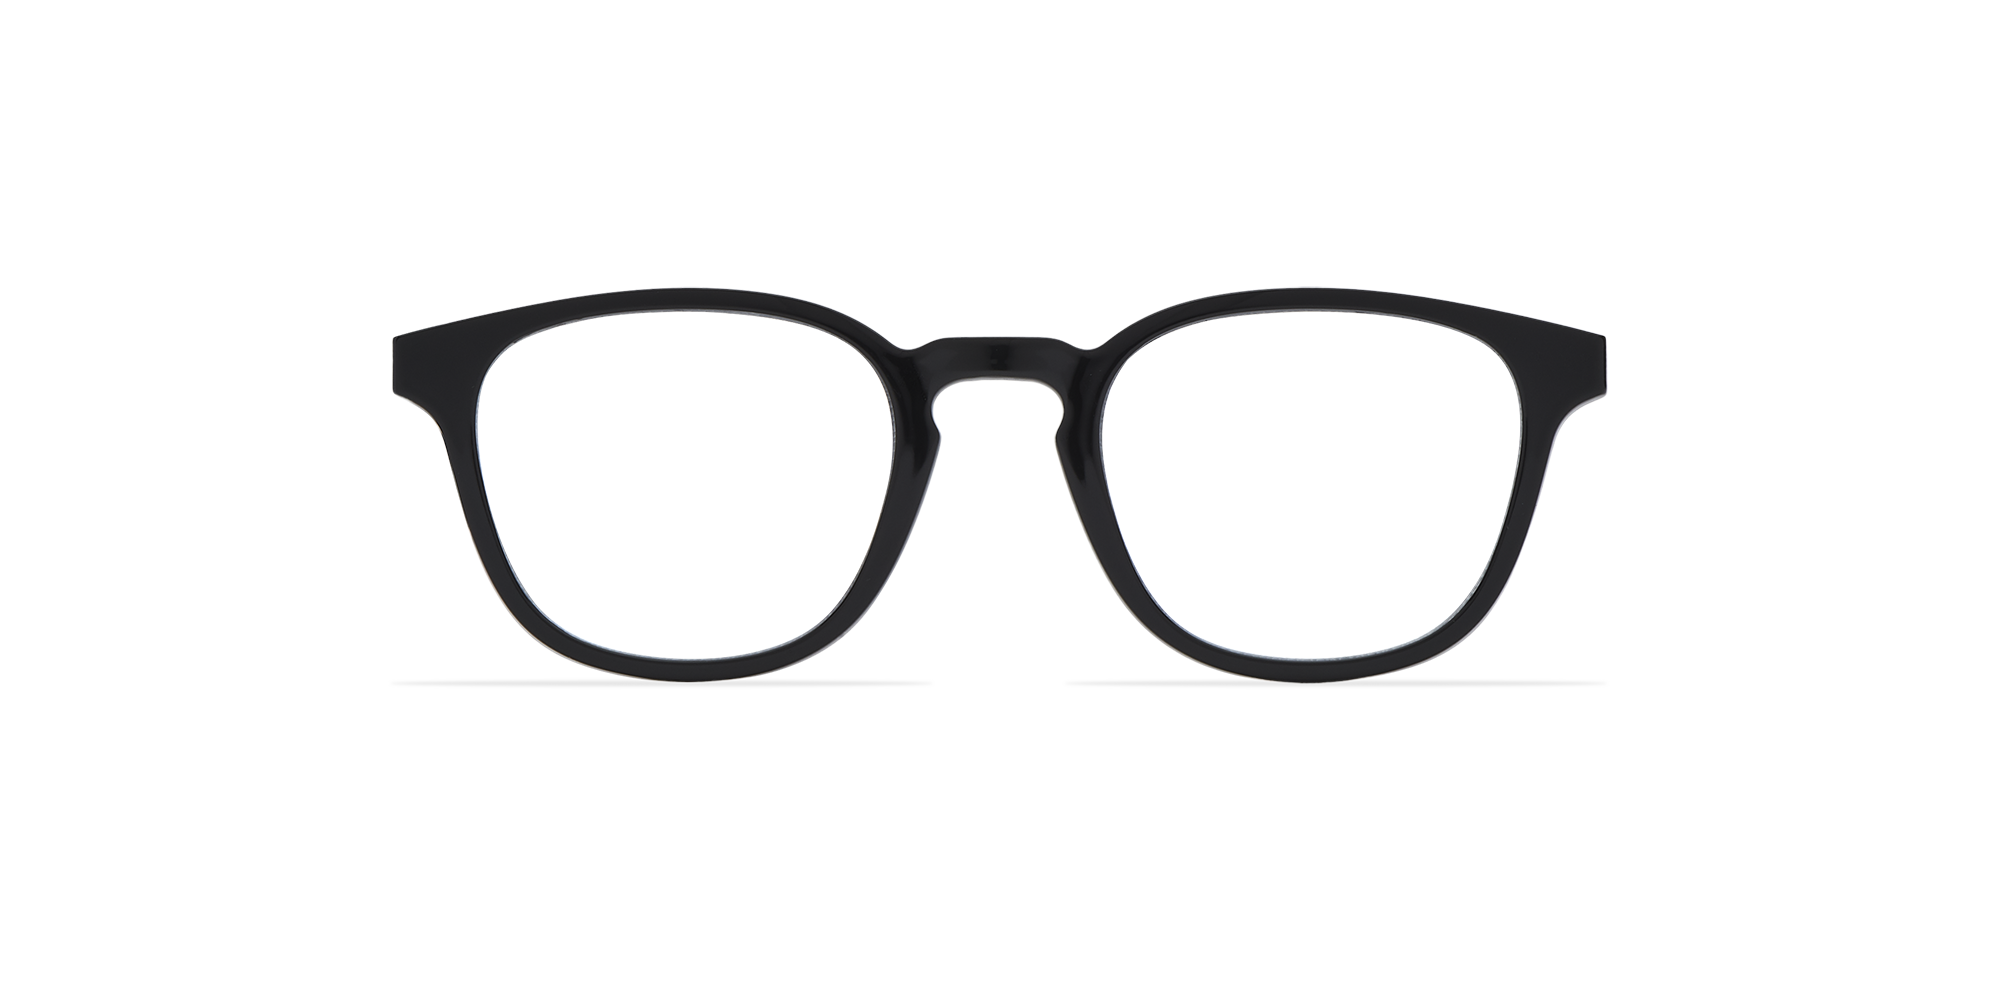 afflelou/france/products/smart_clip/clips_glasses/07630036429303_face.png